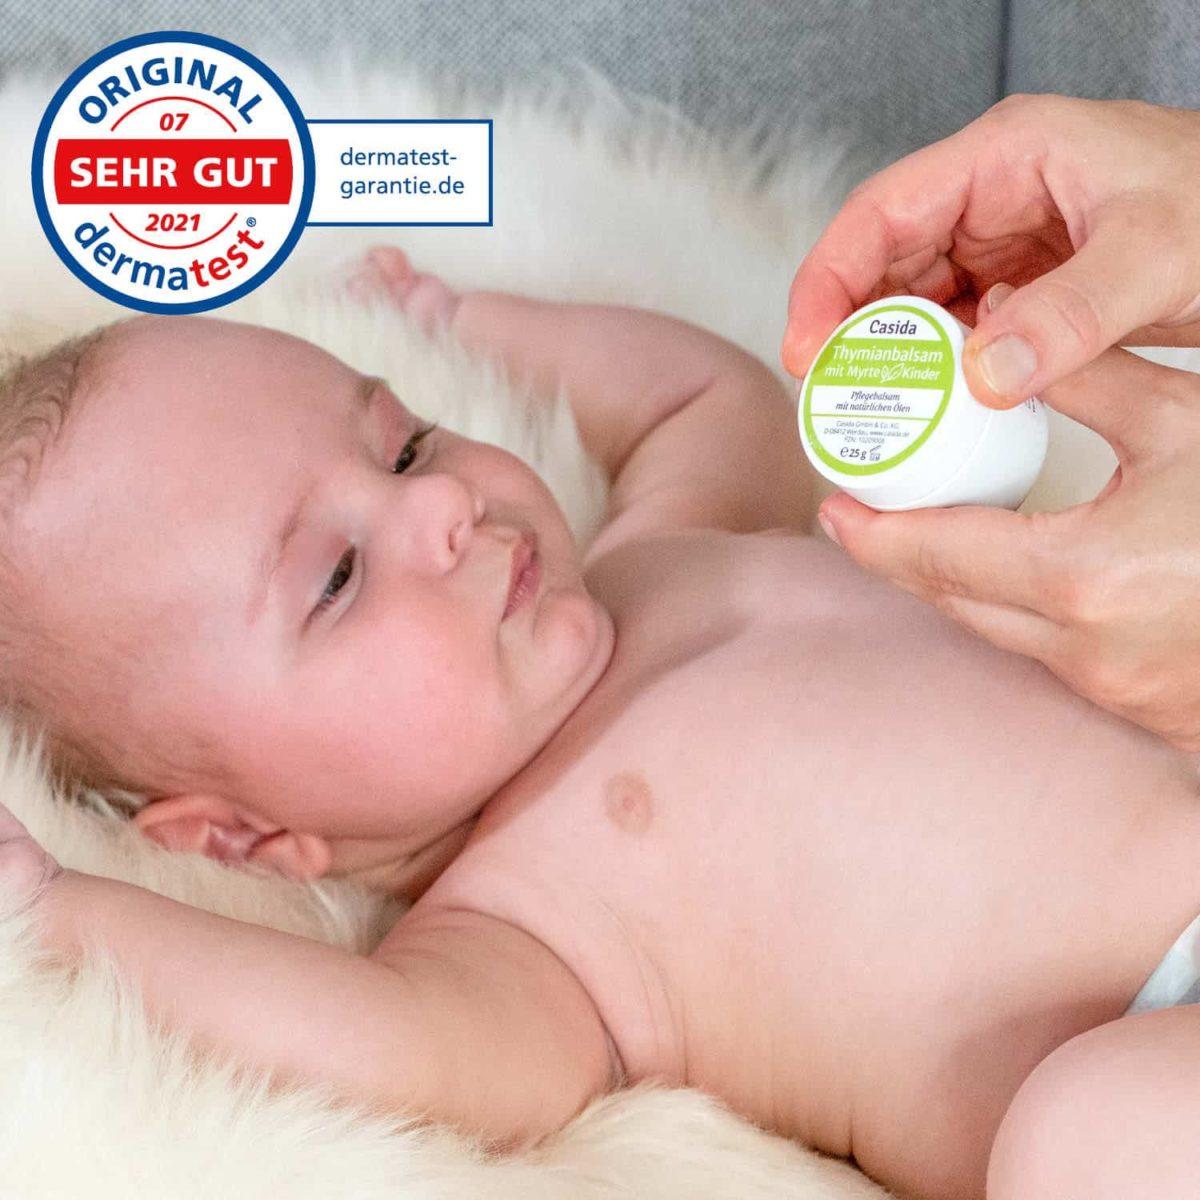 Casida Thyme Balm with Myrtle for Children 25 g 10209008 PZN Apotheke Husten Baby8